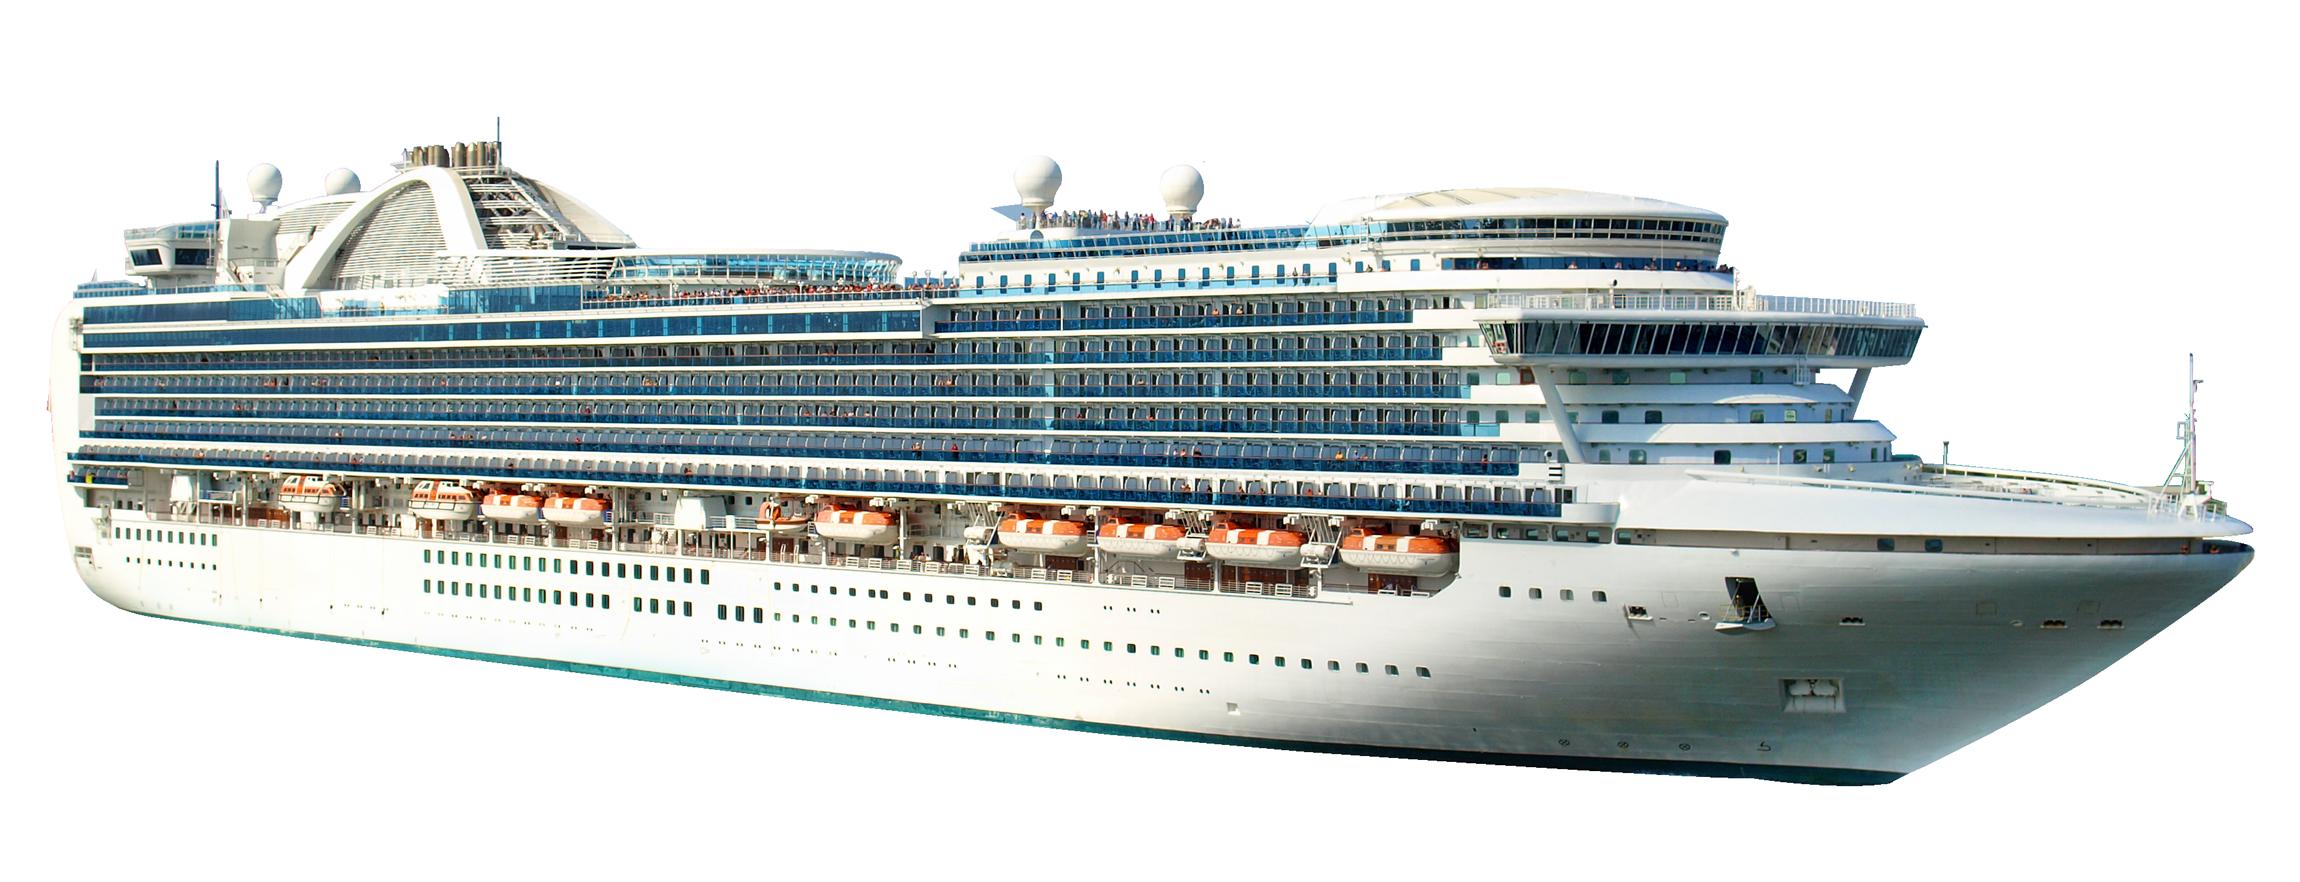 Cruise Ship PNG Image.